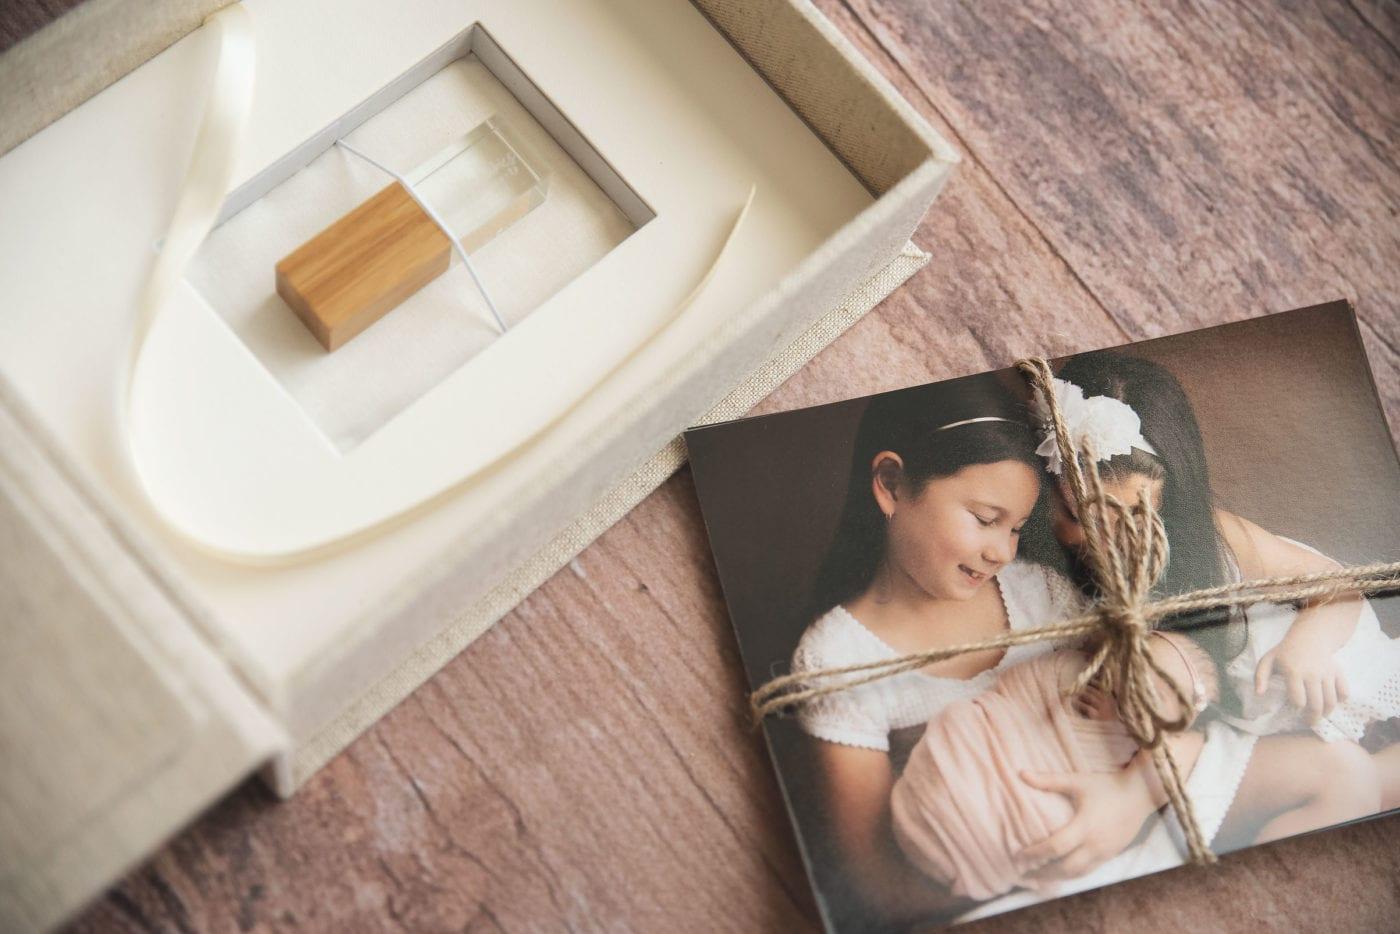 newborn-photography-pricing-baby-photographer-sydney